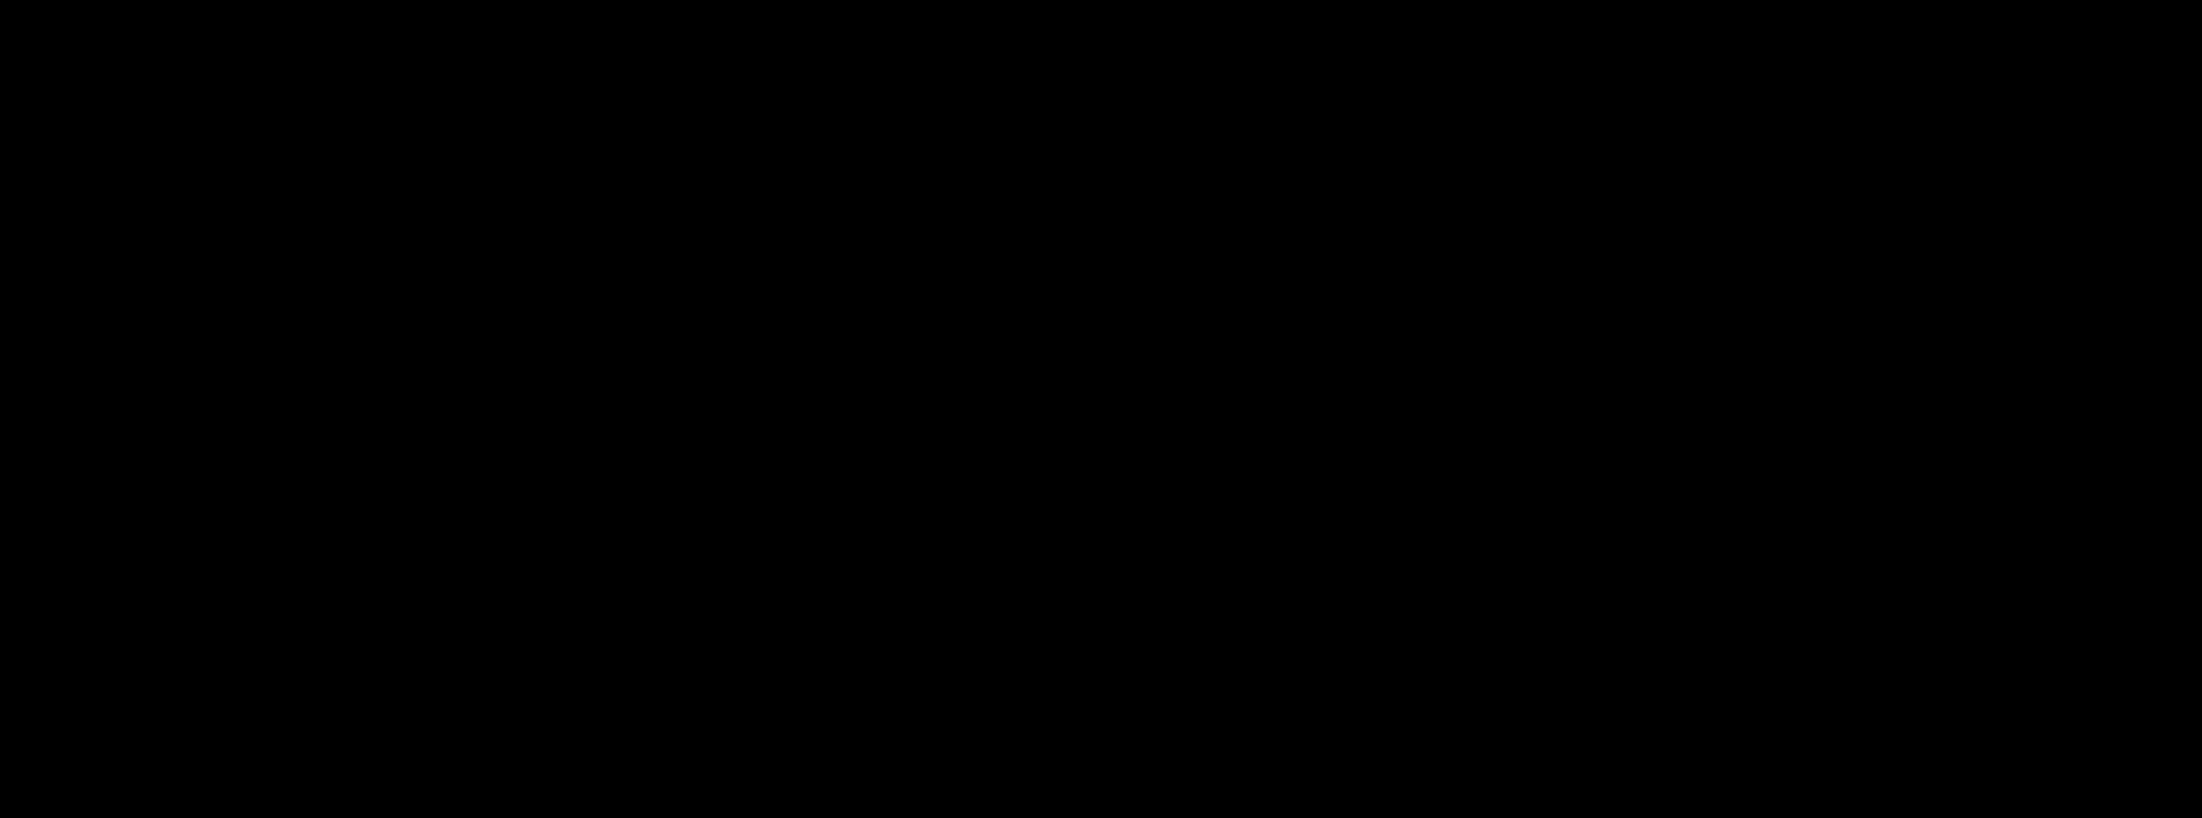 Biotinyl cystamine